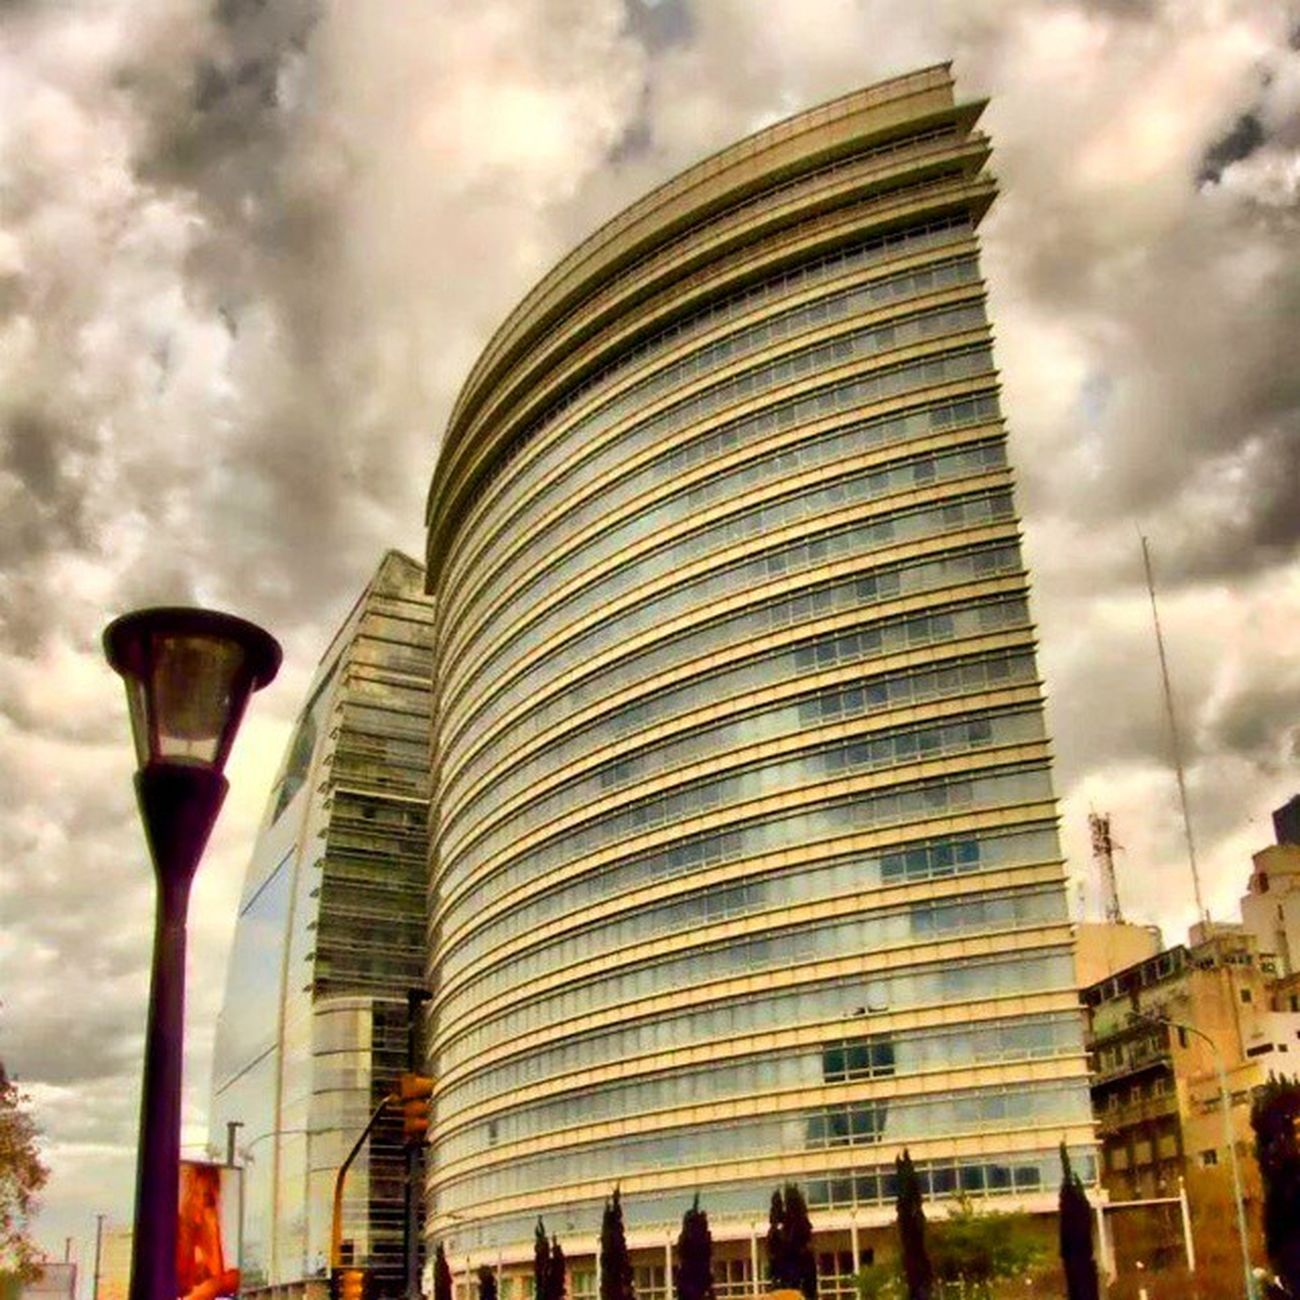 Buenosaires Ciudaddelafuria Edificio HDR photooftheday gopro goprooftheday goprohero3